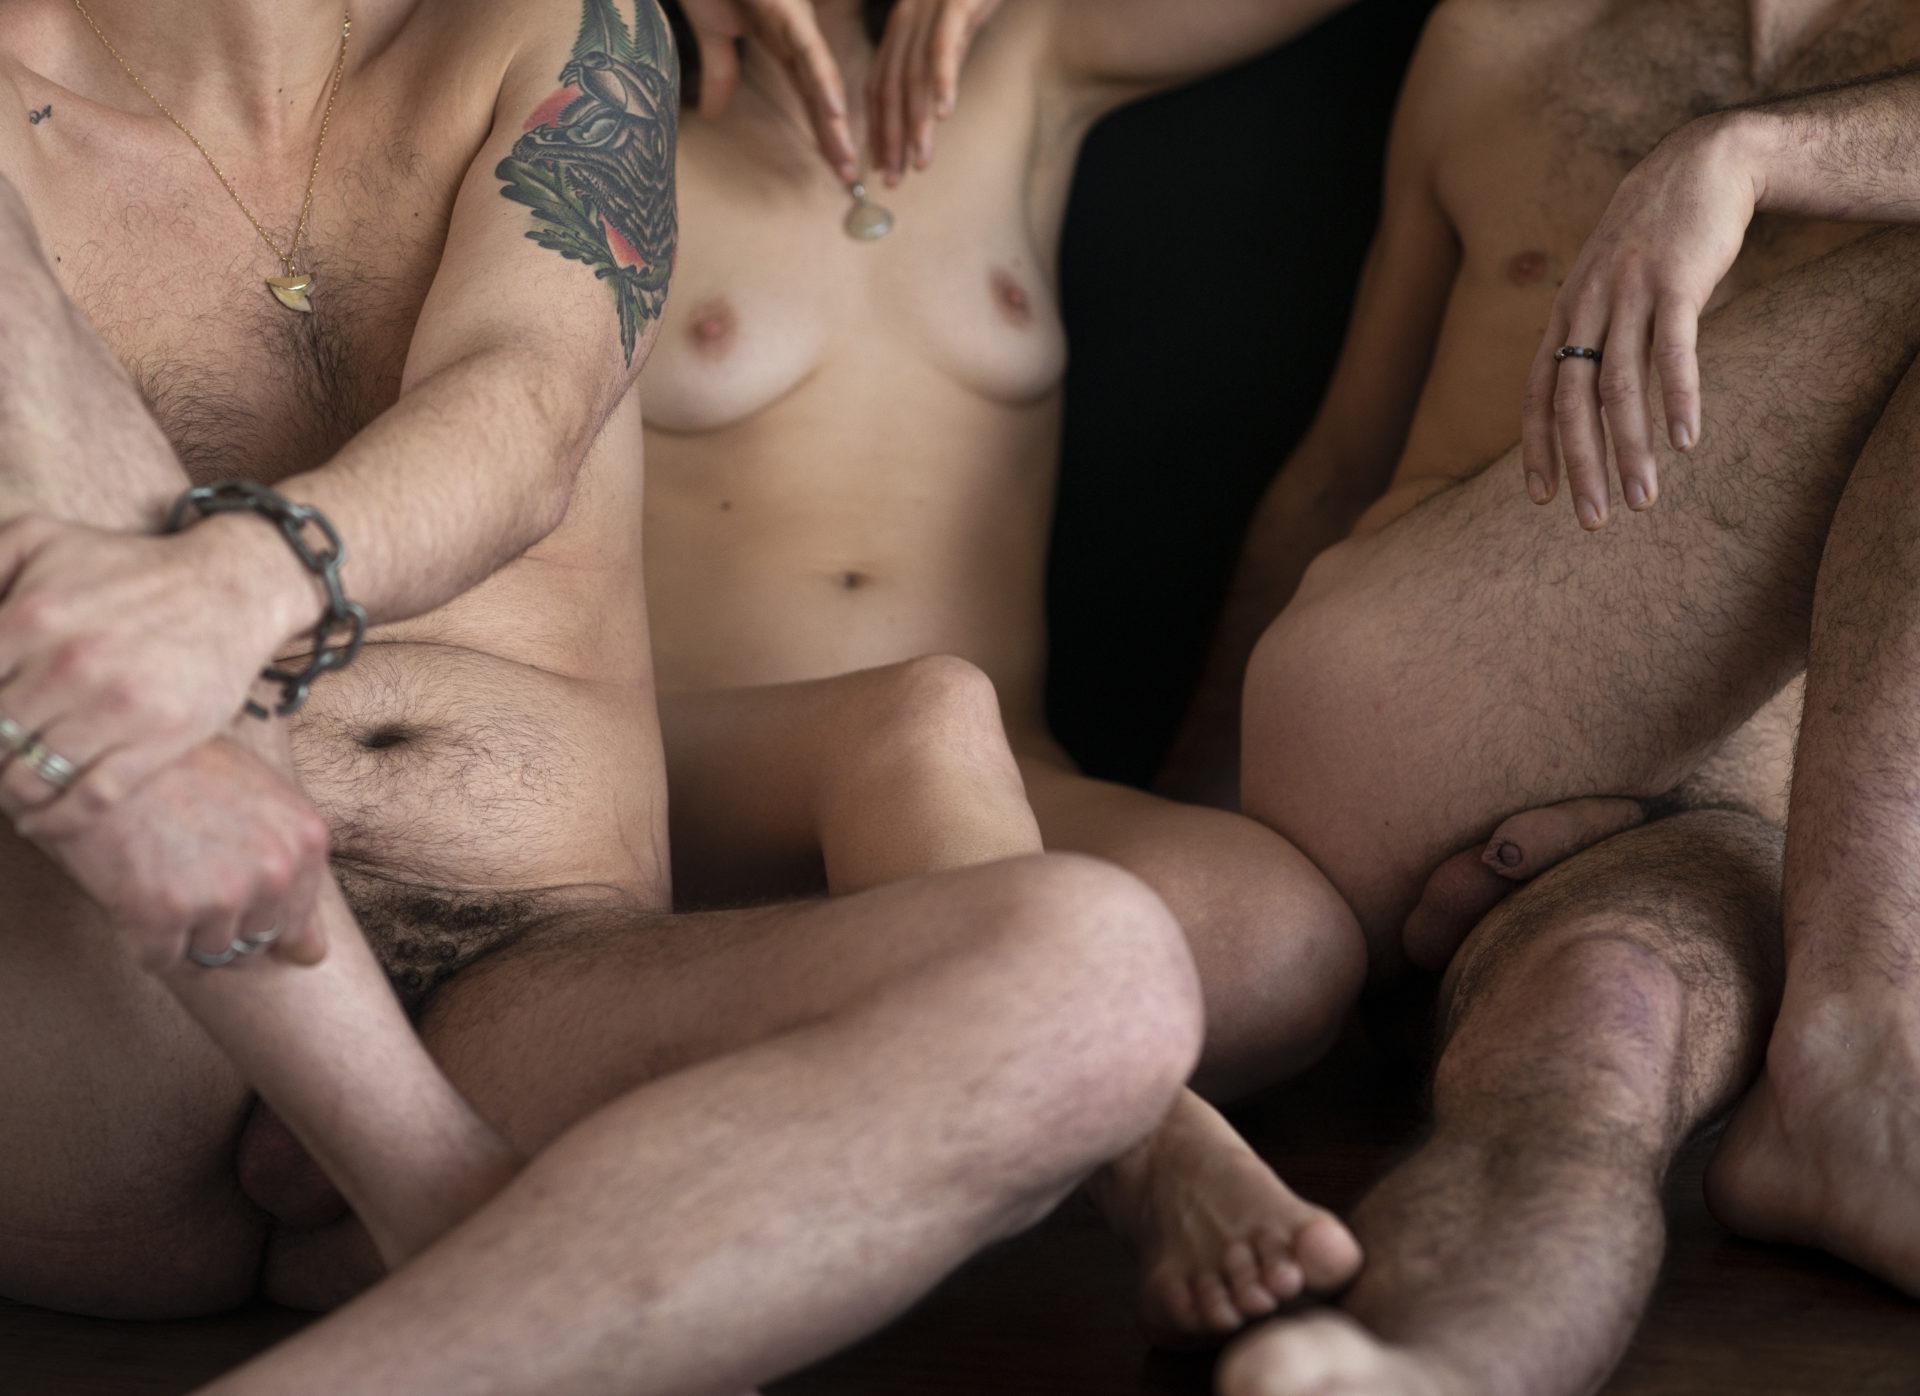 Manon, Jérémy et Théo